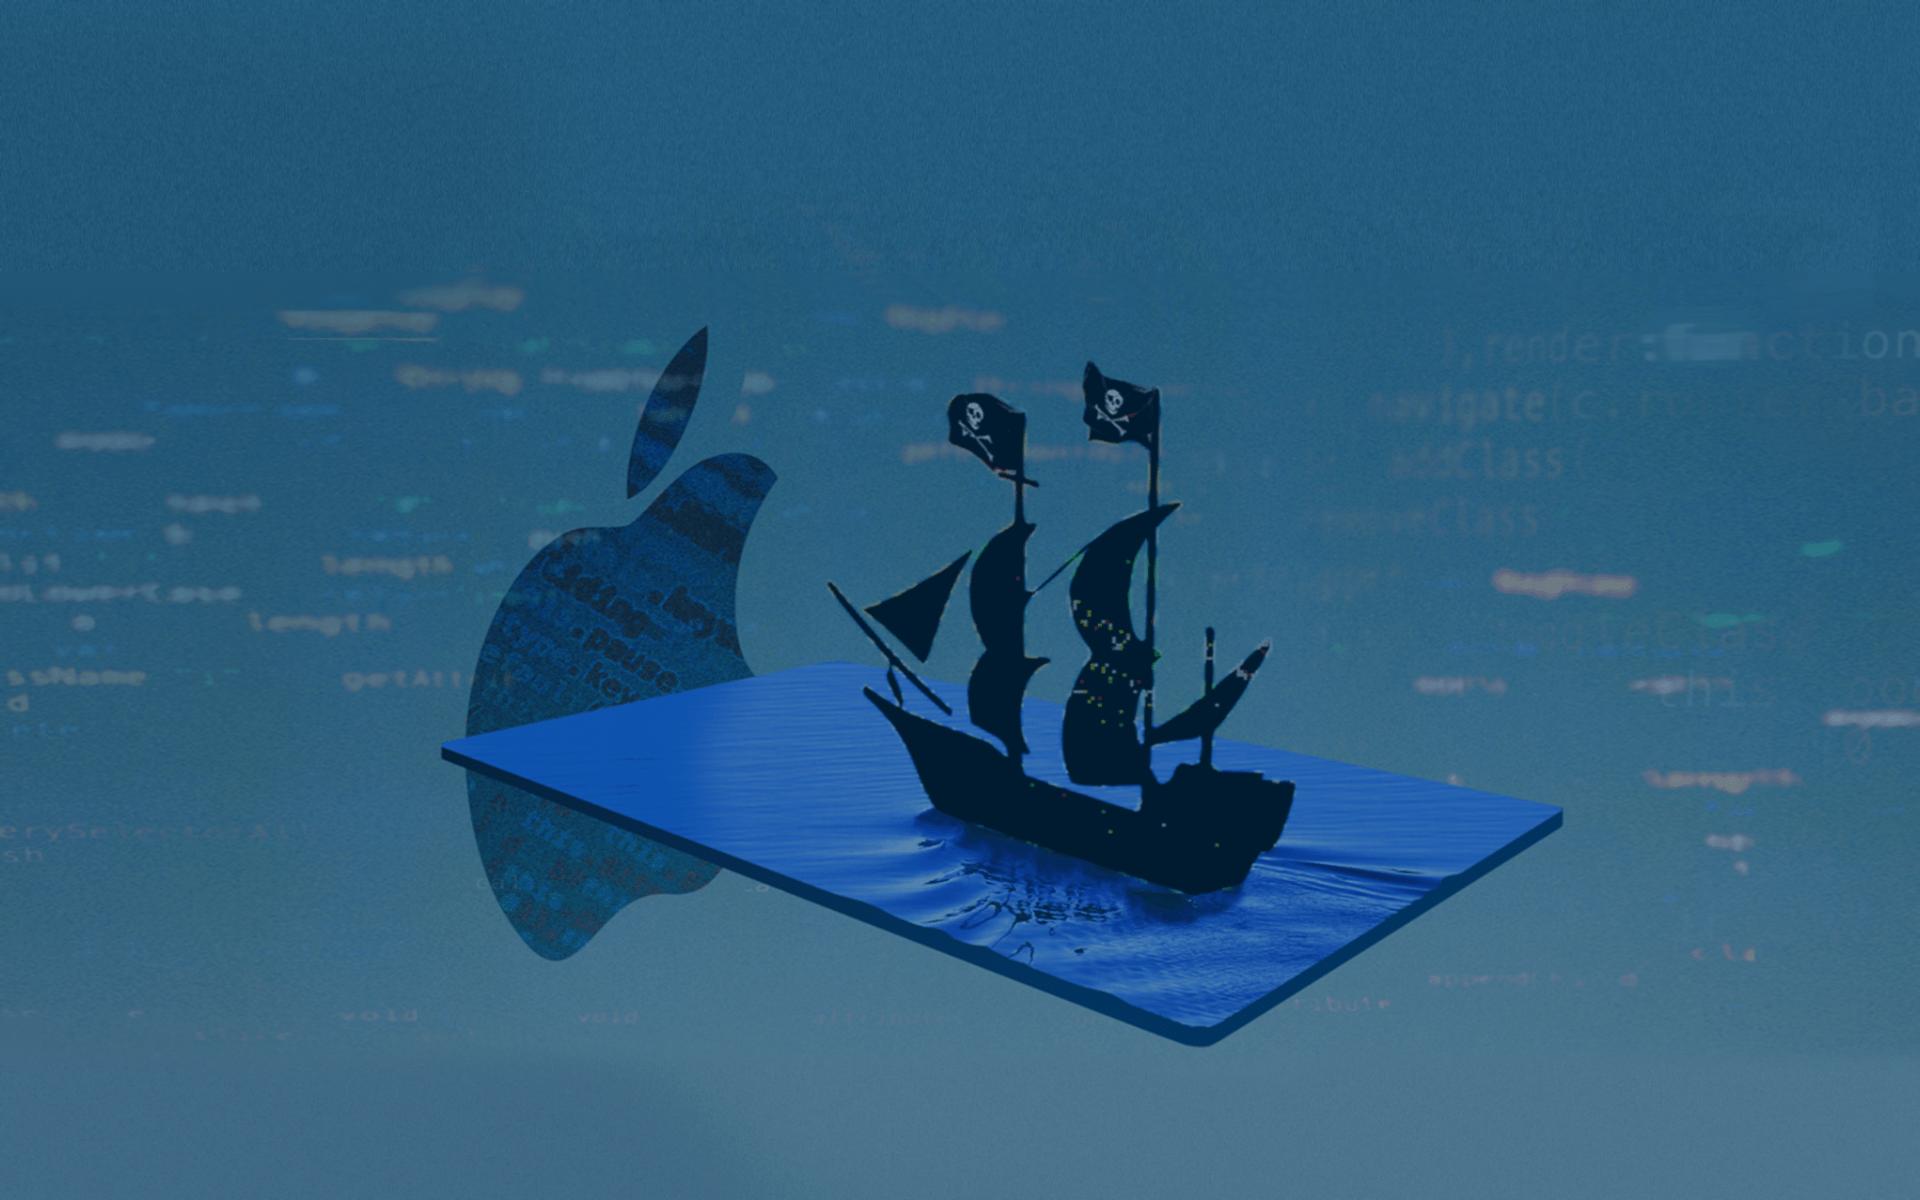 webinar-landing-page-background-piracy_-1